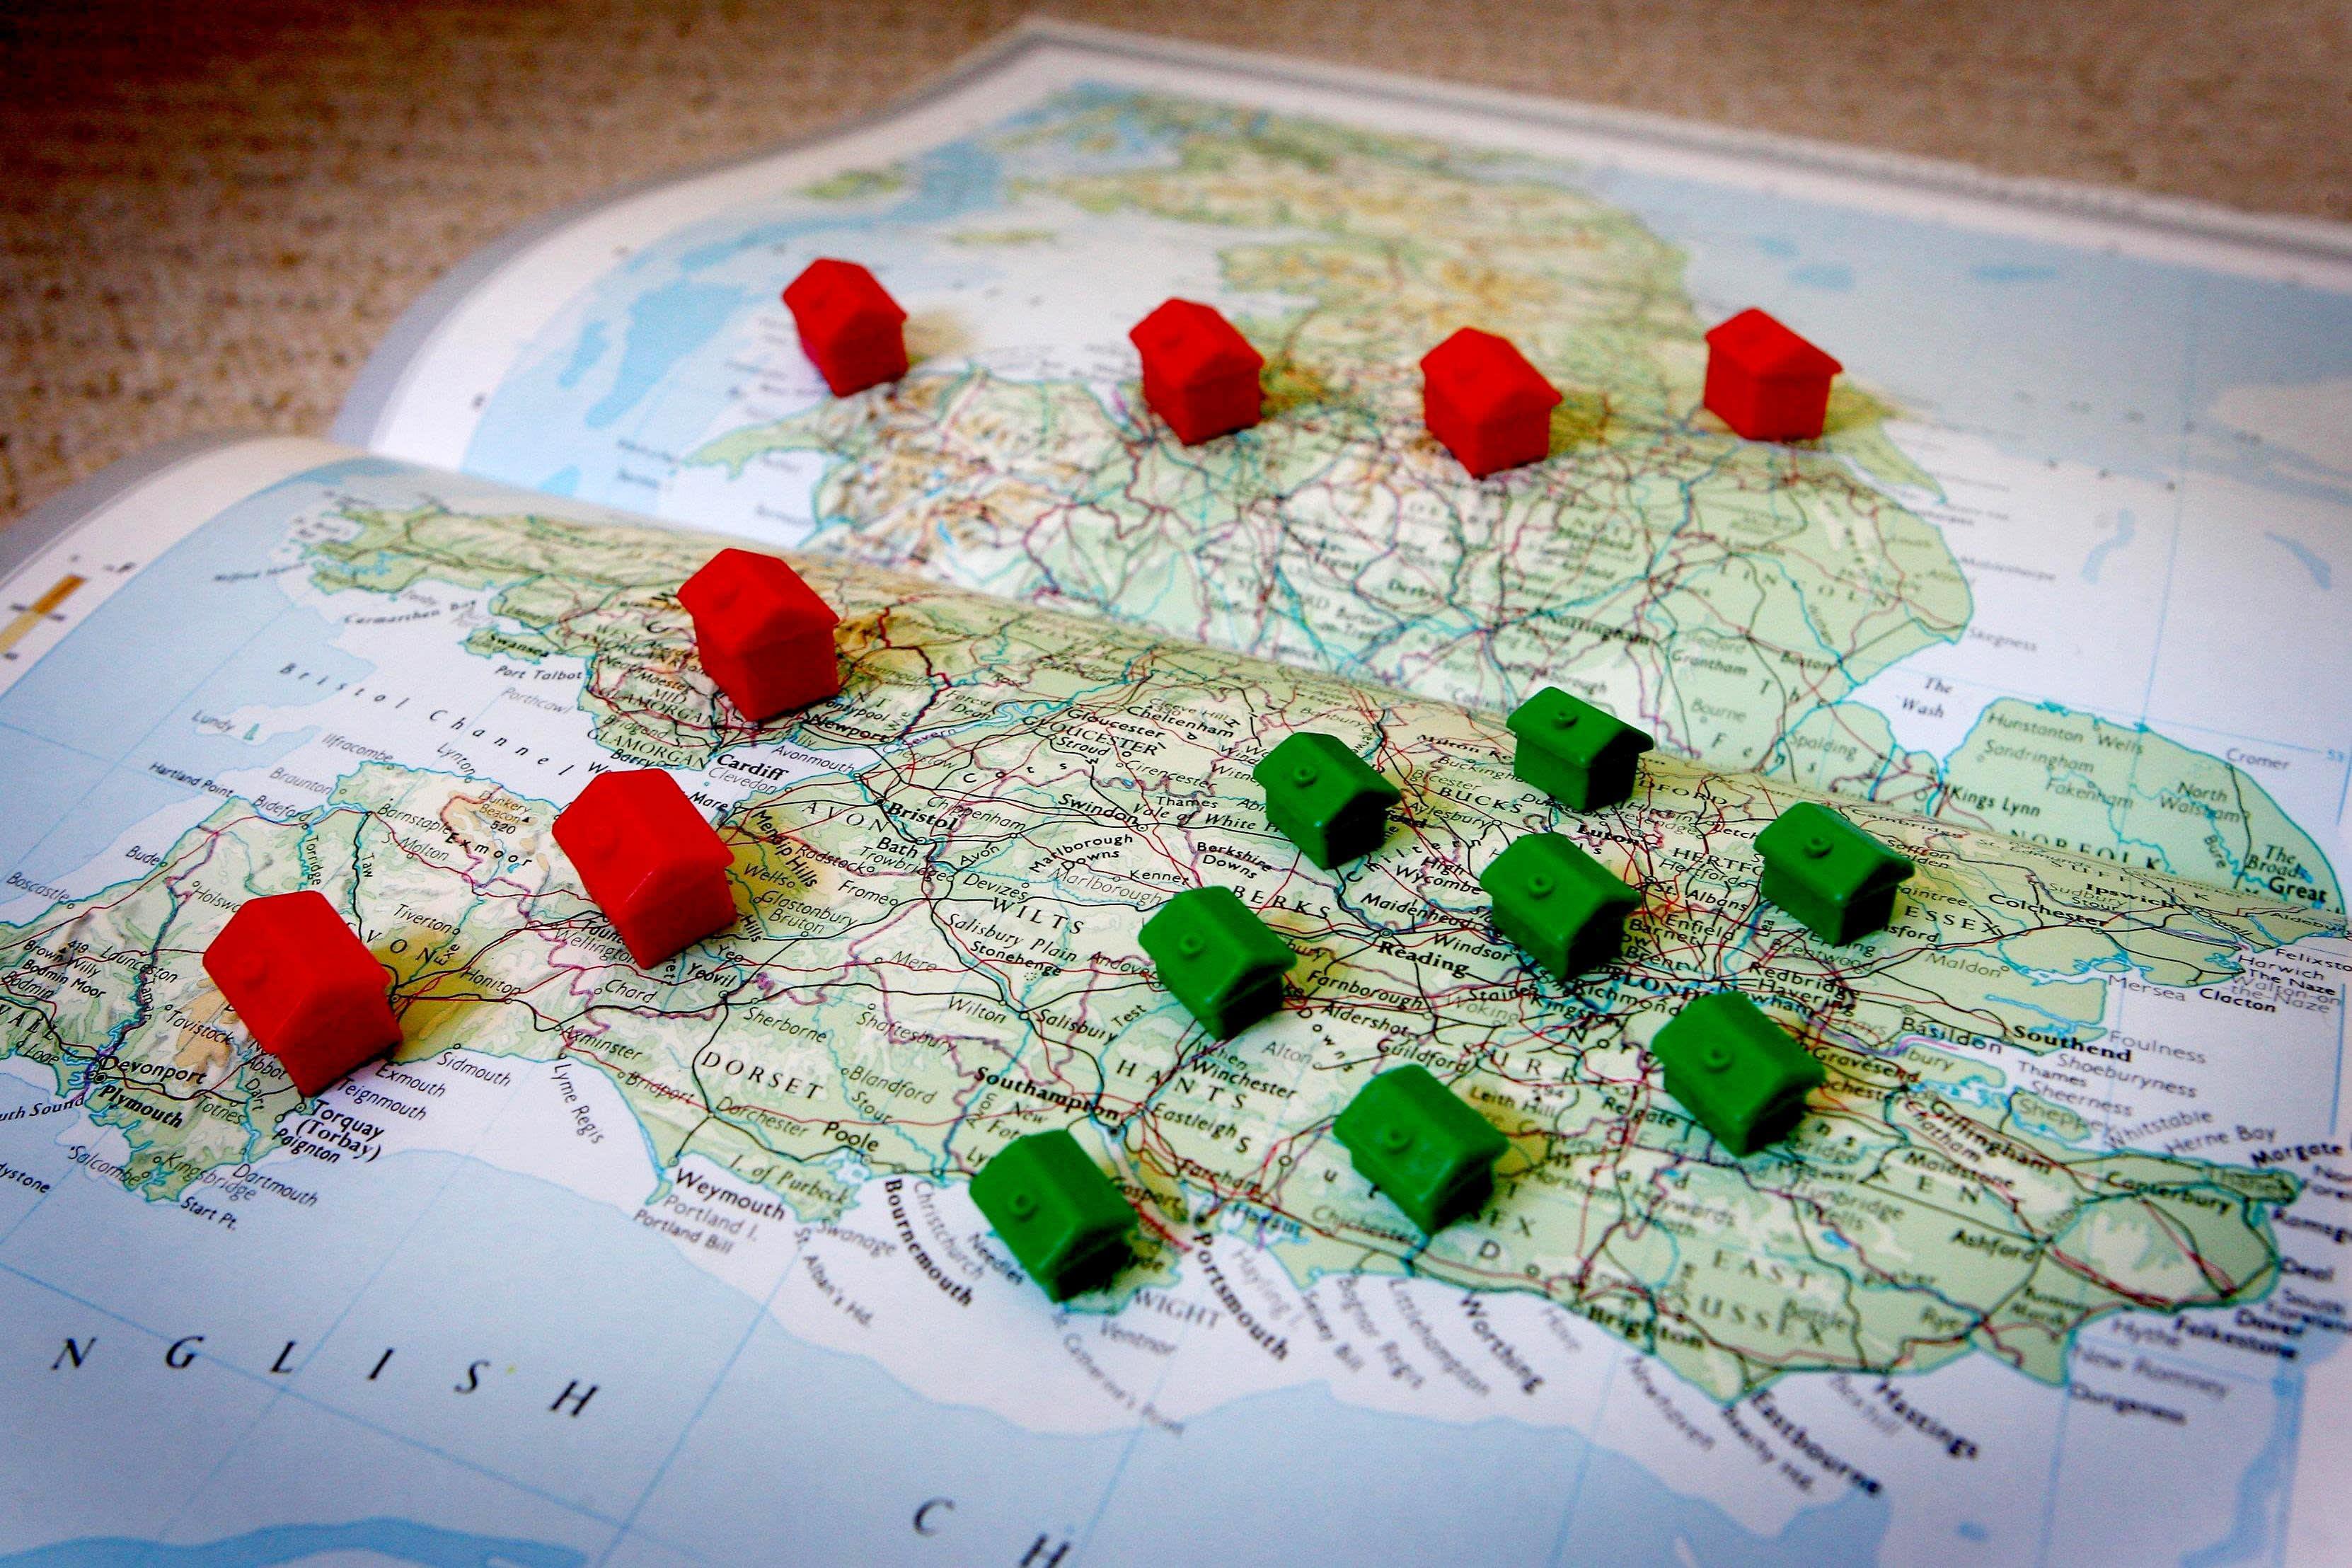 Tenet buys two advisers in regional drive